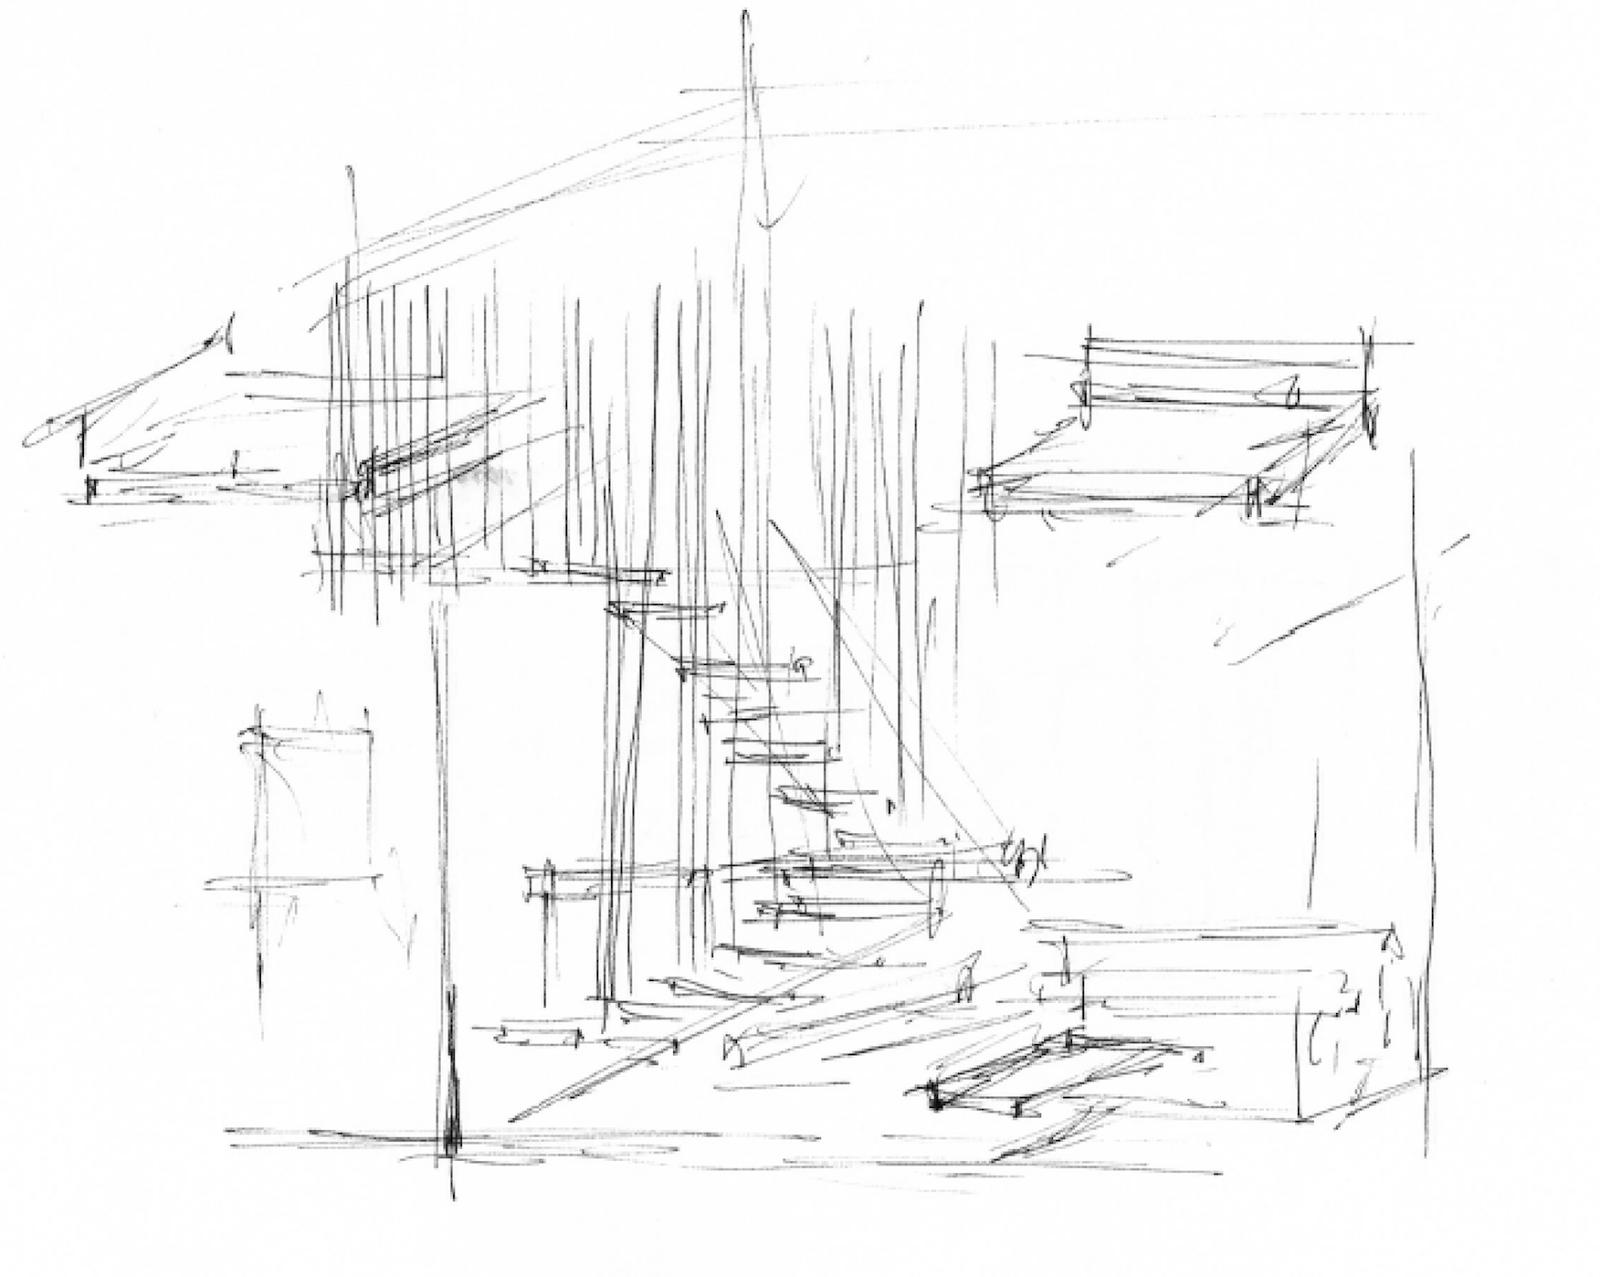 Design Studio IIA (Spatial) 257 Kaitiakitanga Danielle